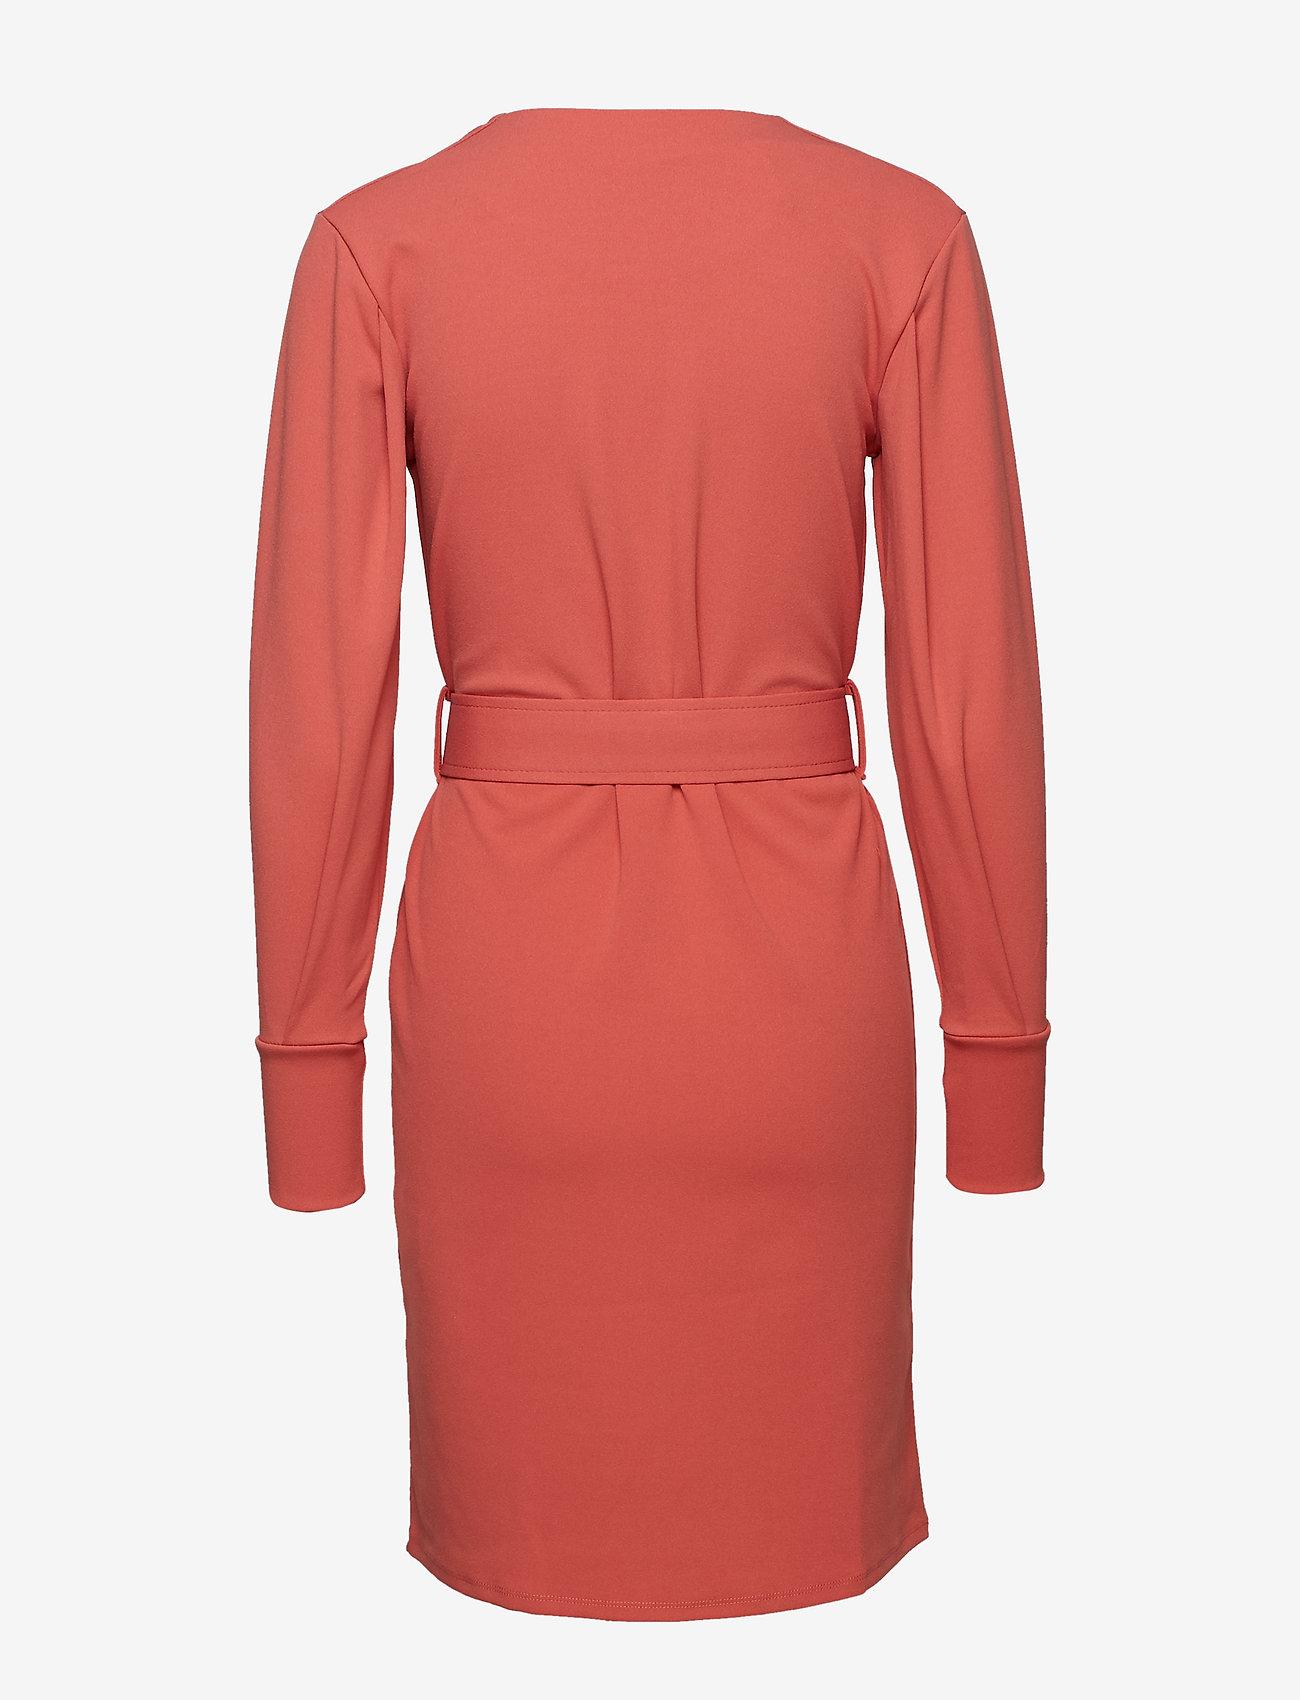 Gina Tricot Marina Belted Dress - Dresses